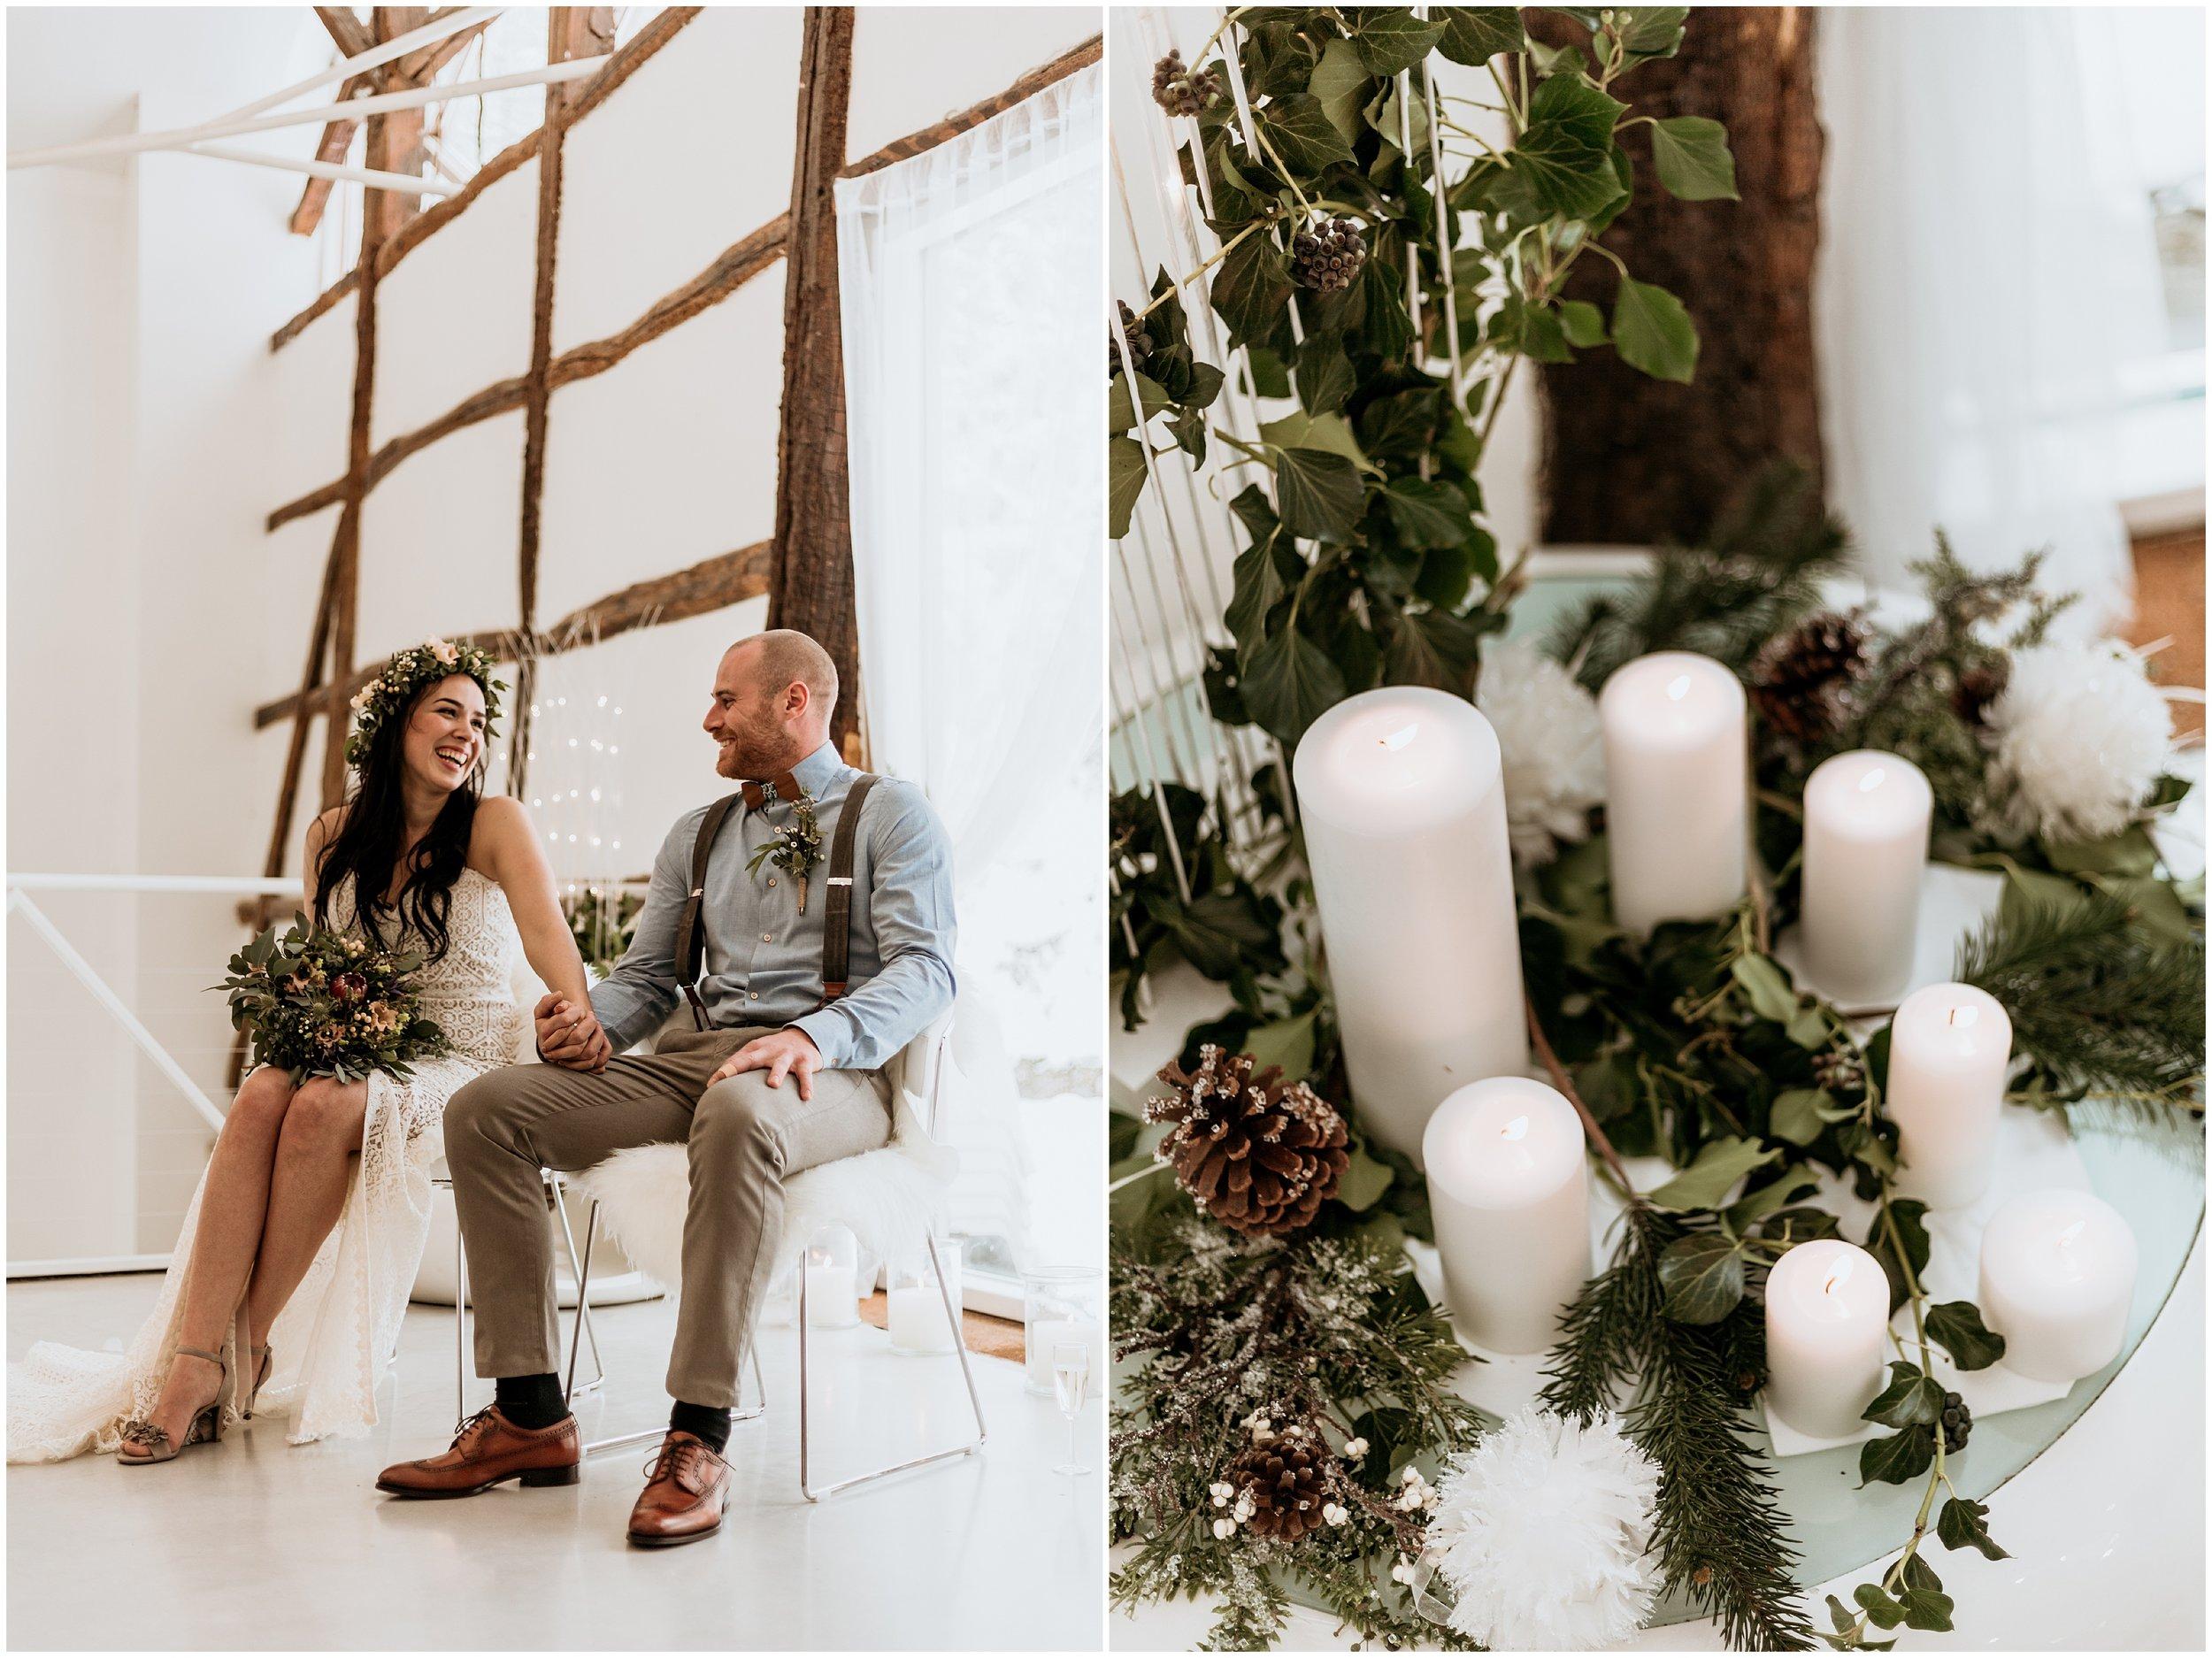 huwelijksfotografie-jana-joeri-ardennen-sechery_0014.jpg